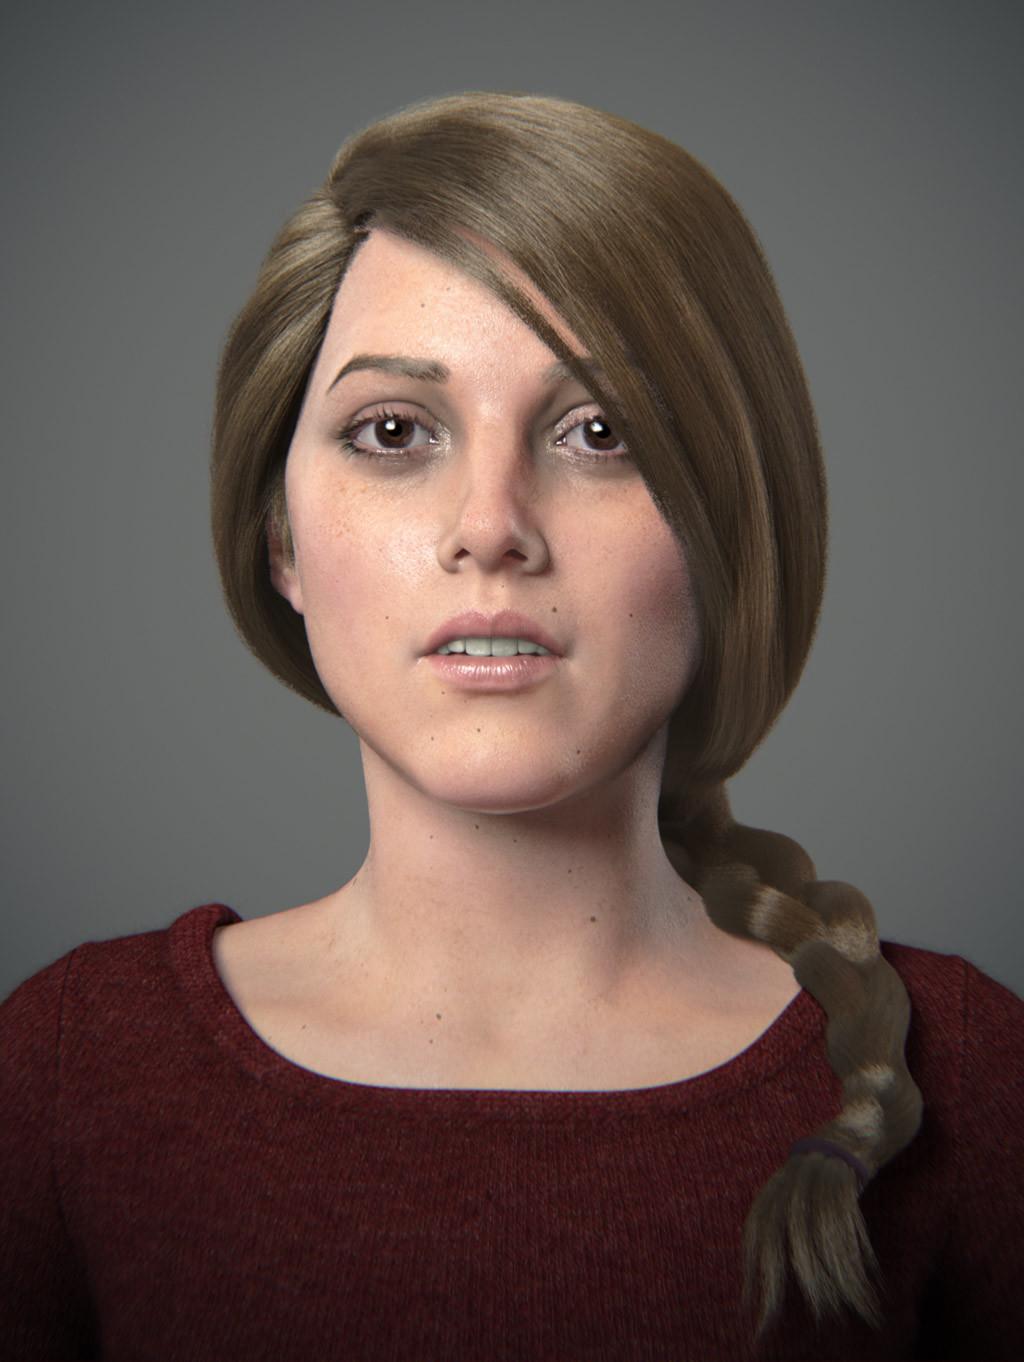 Zoltan korcsok girlportrait